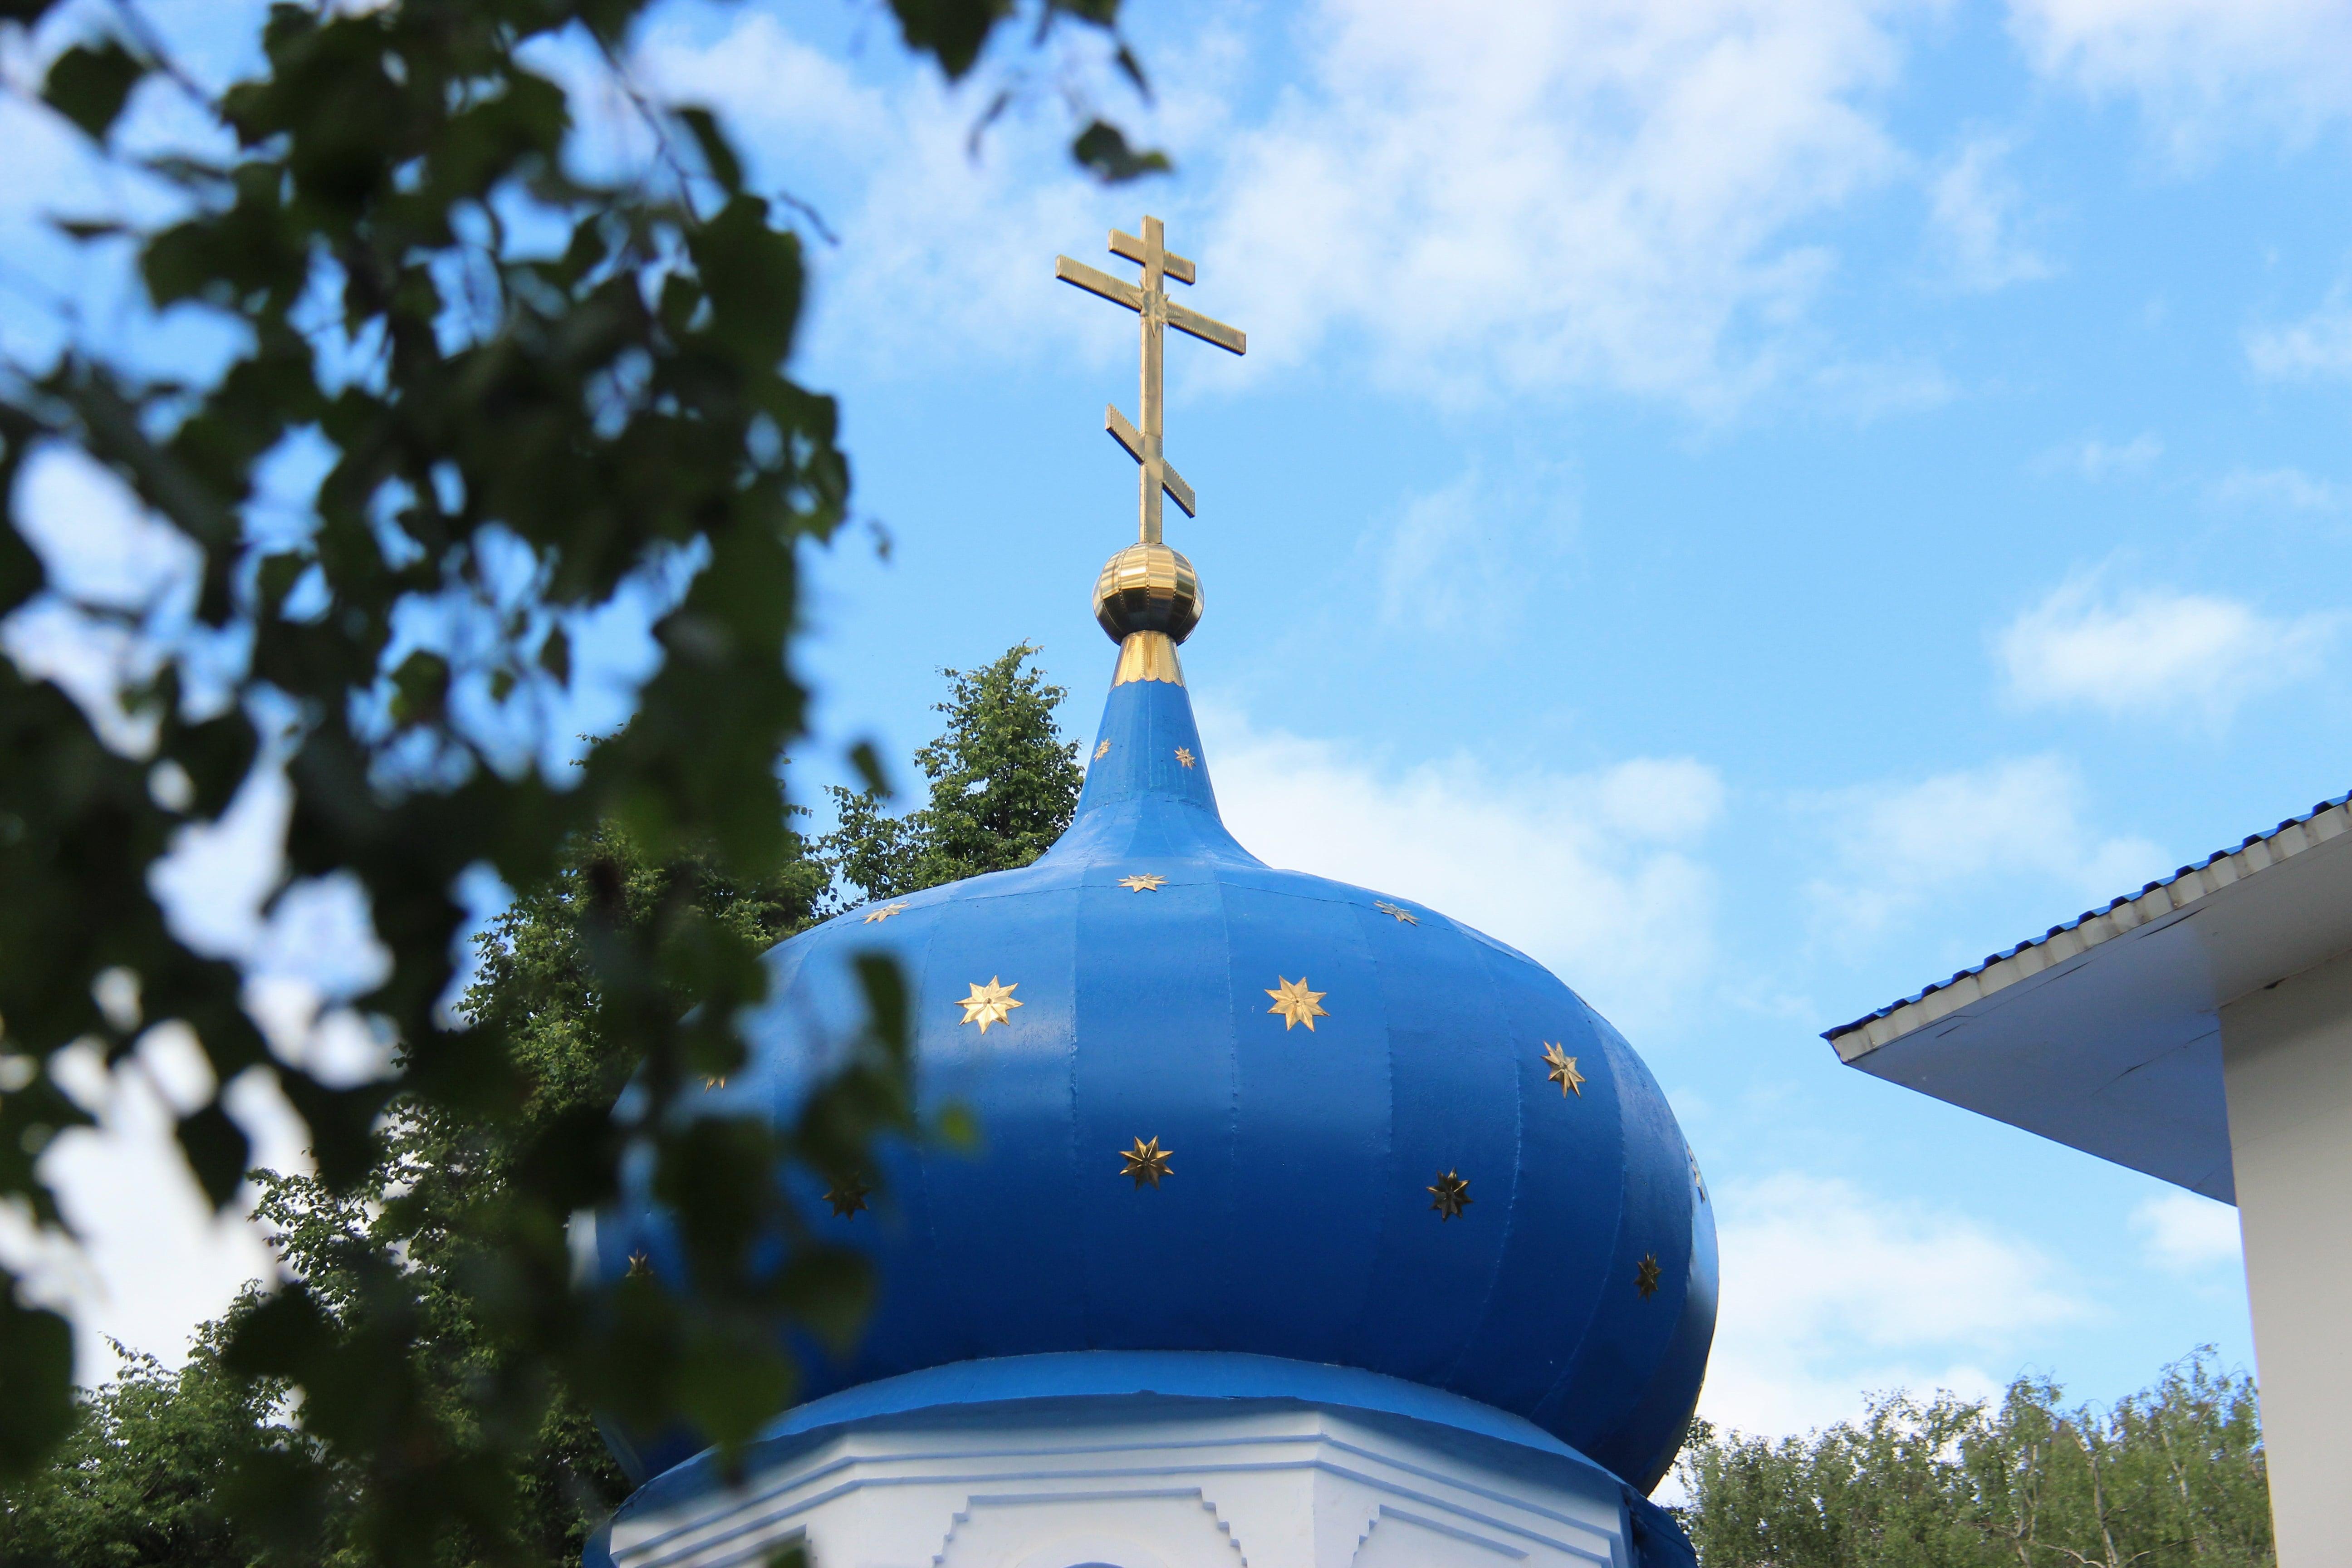 http://monuspen.ru/photoreports/f0fd1d8b1ea6bf9e46e234a1b58ab440.JPG